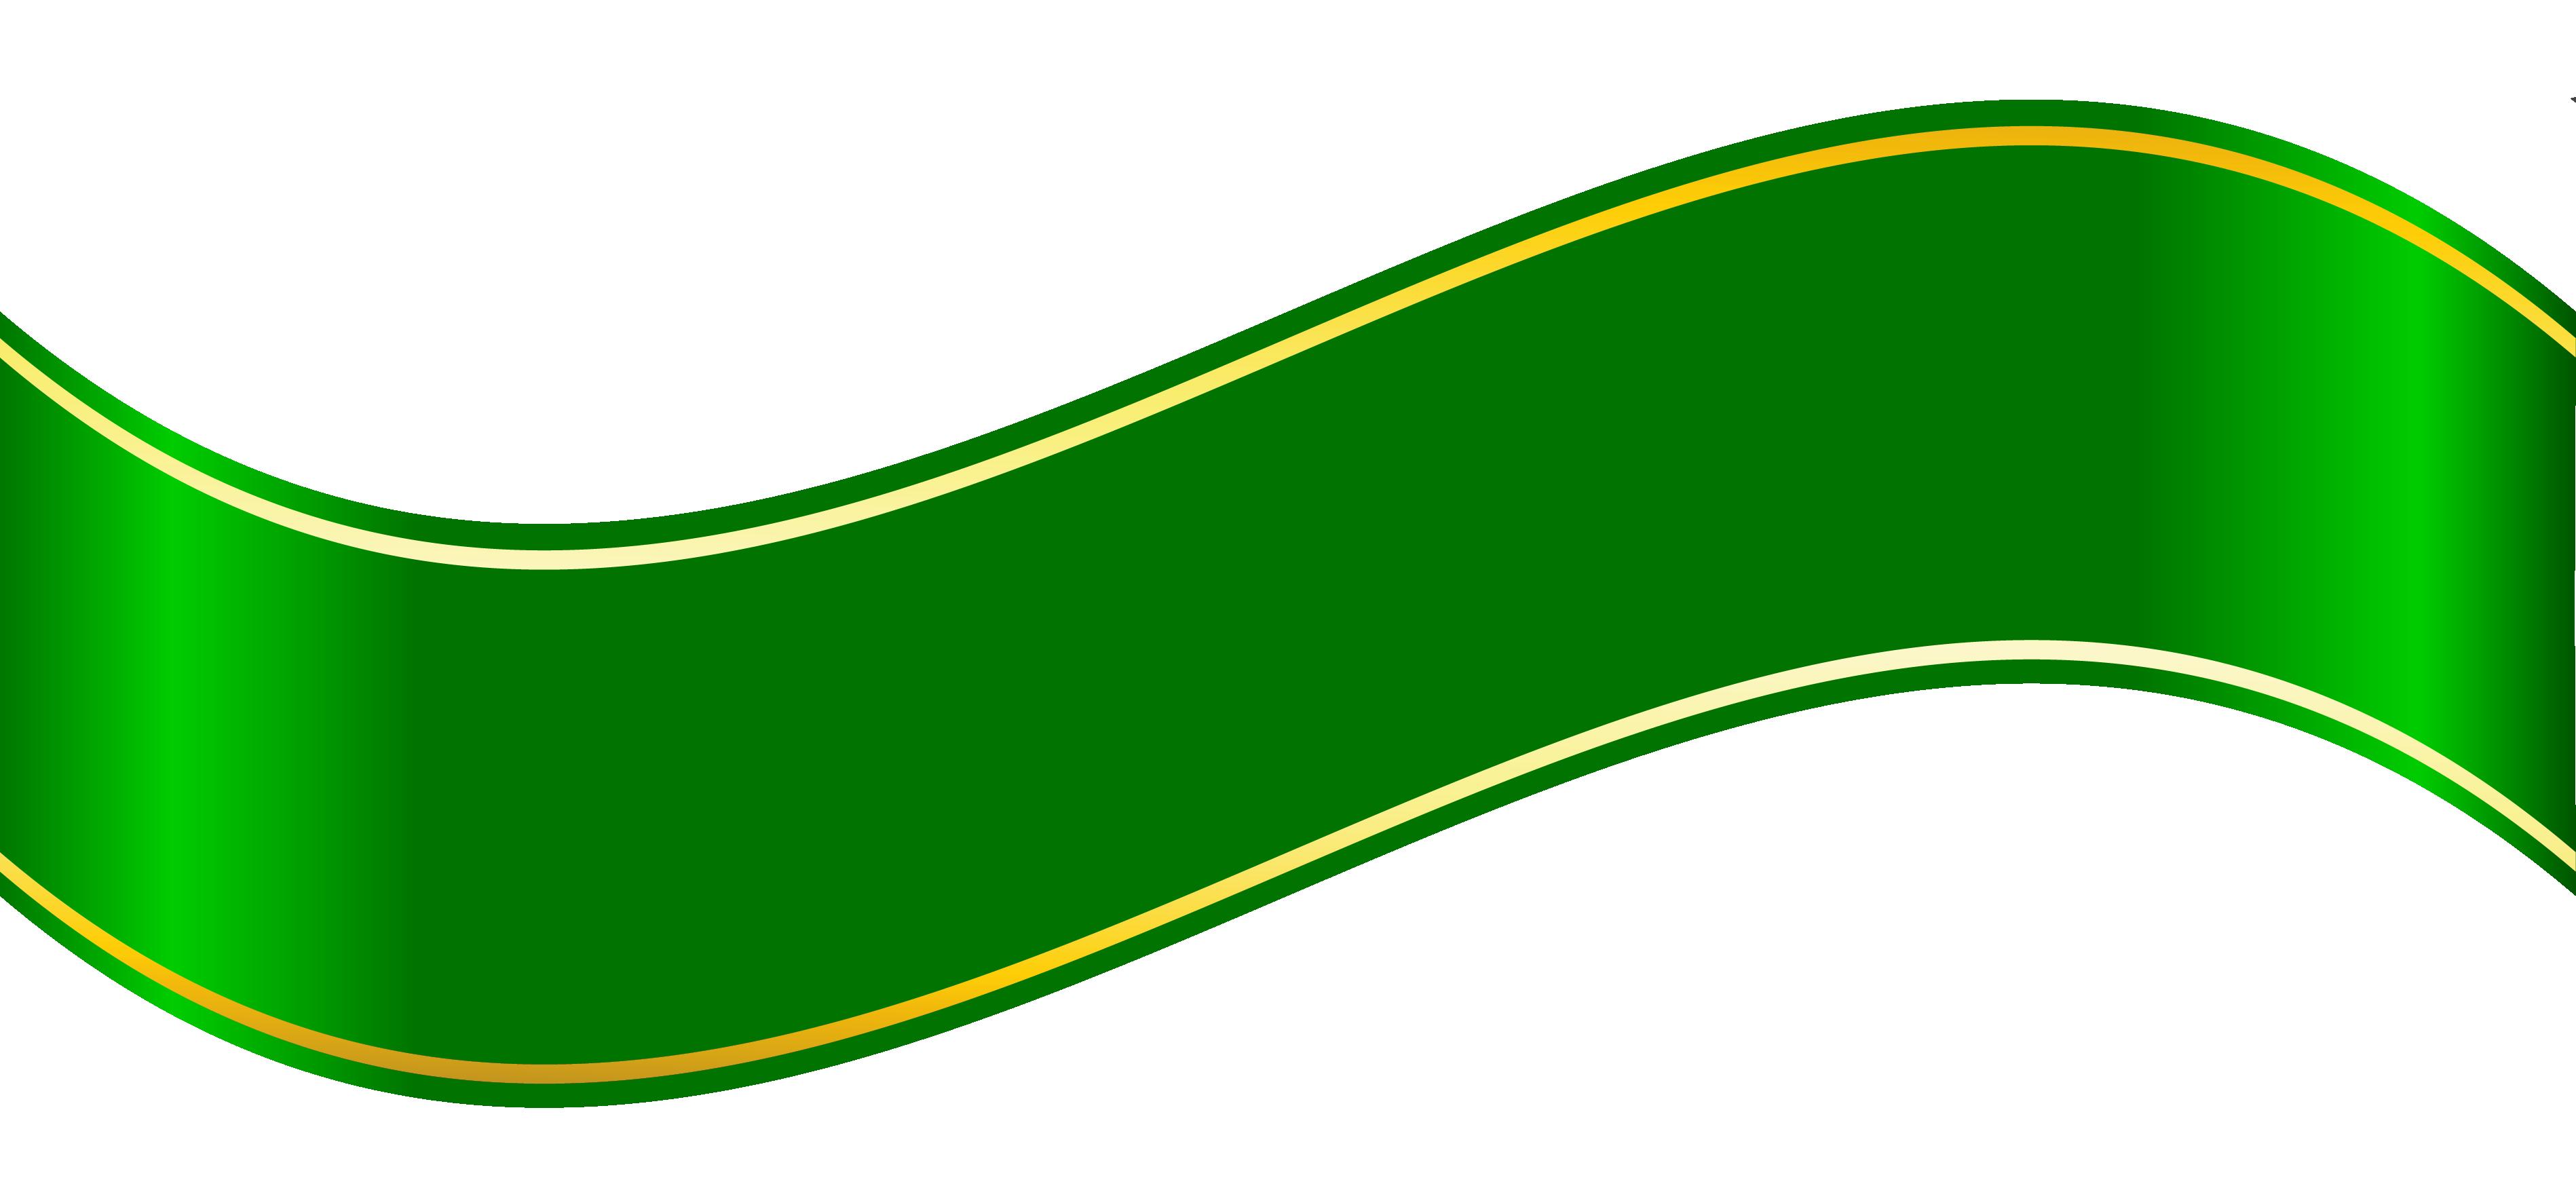 free clip art green ribbon - photo #34